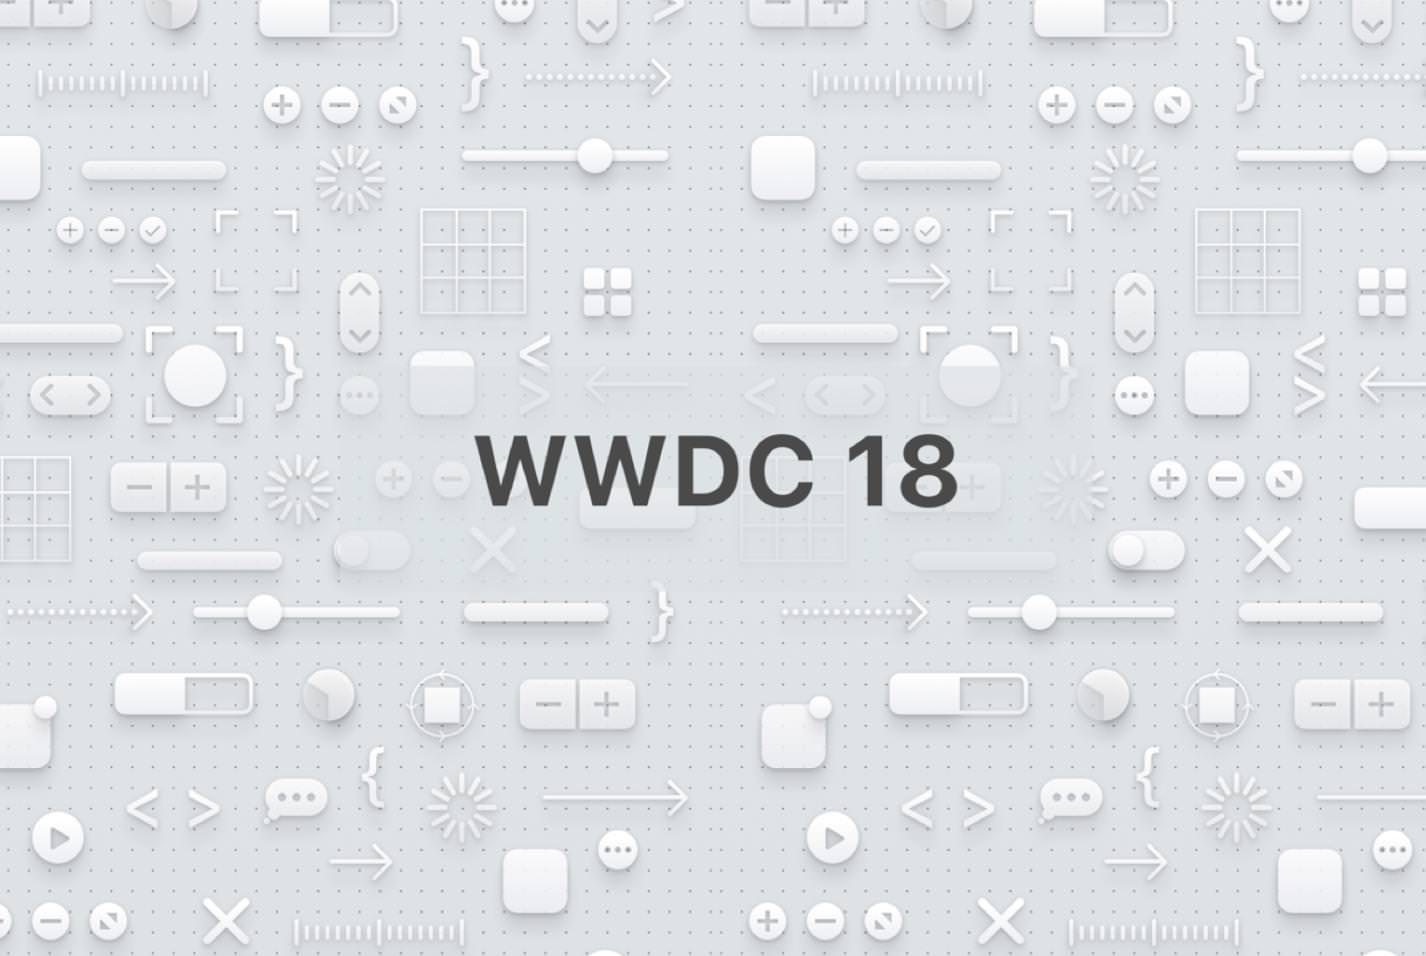 WWDC.jpg by Rahul Bir